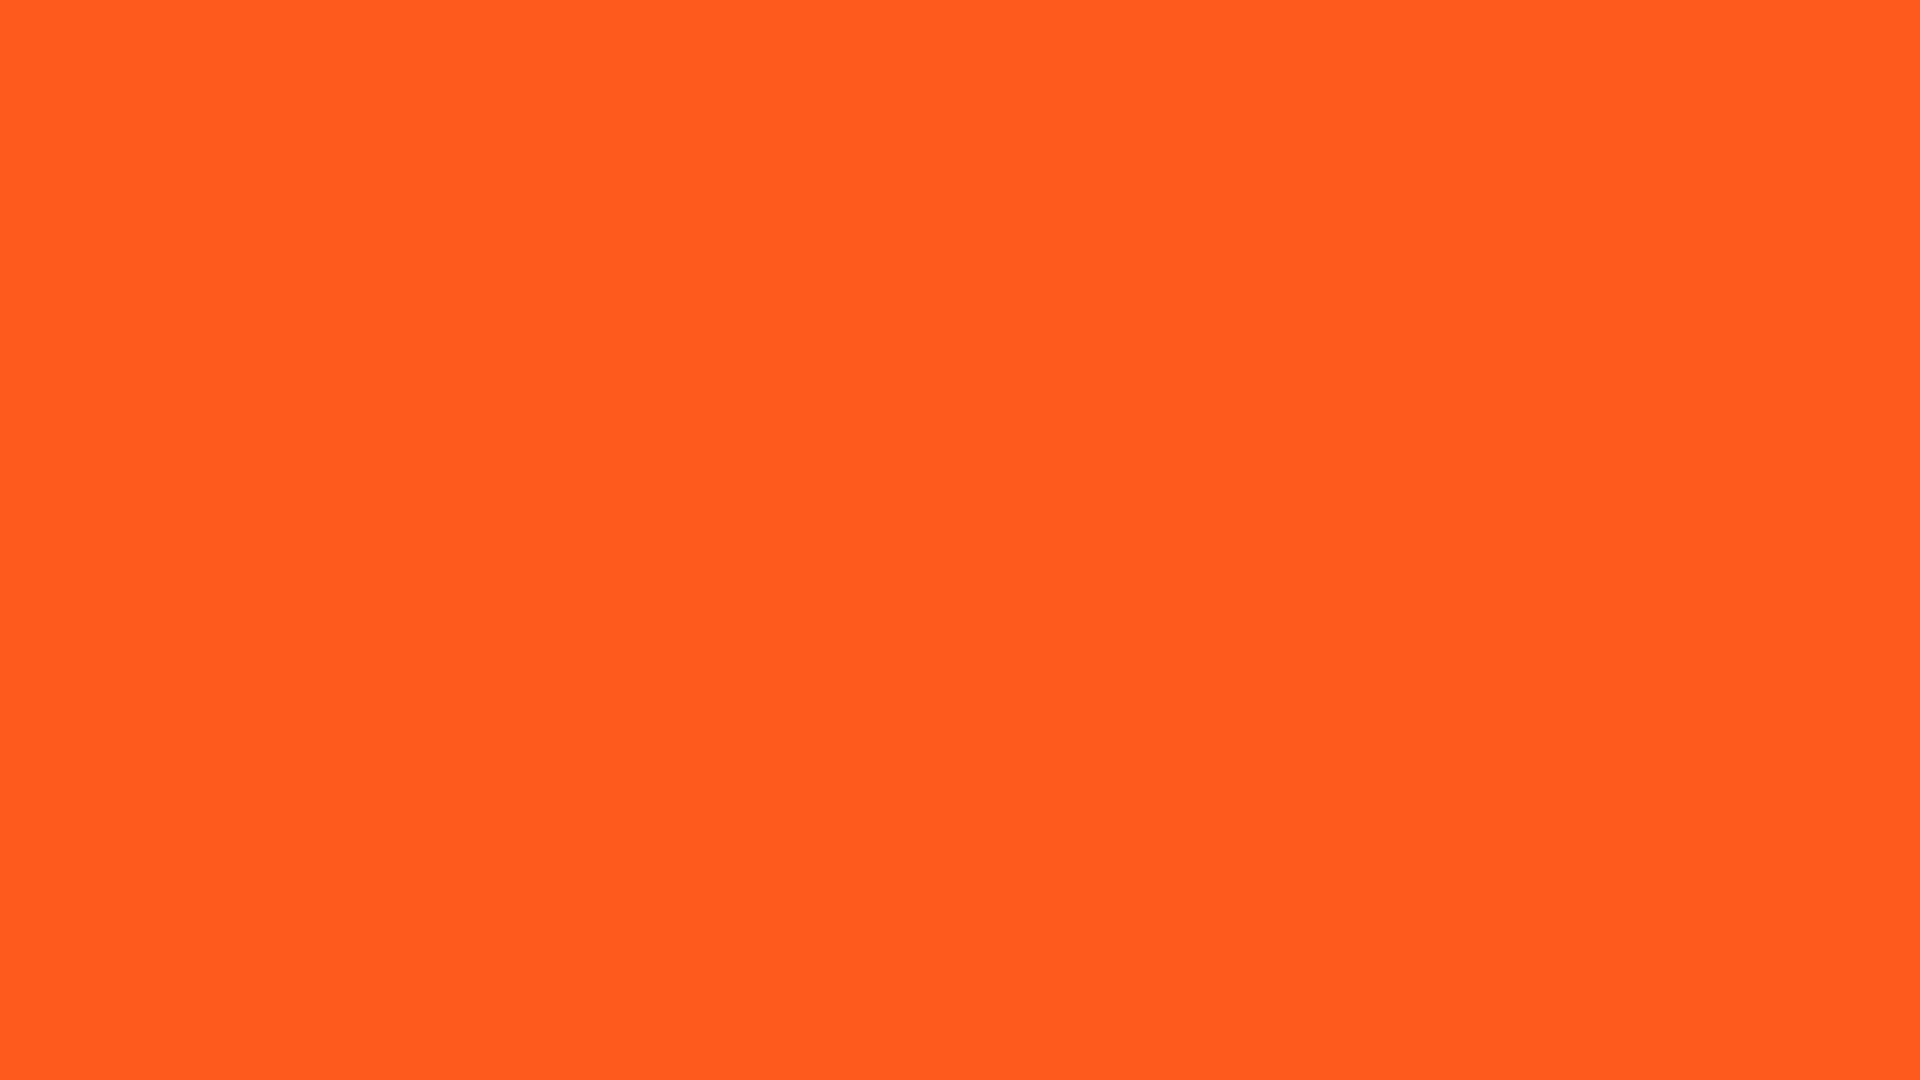 1920x1080 Giants Orange Solid Color Background